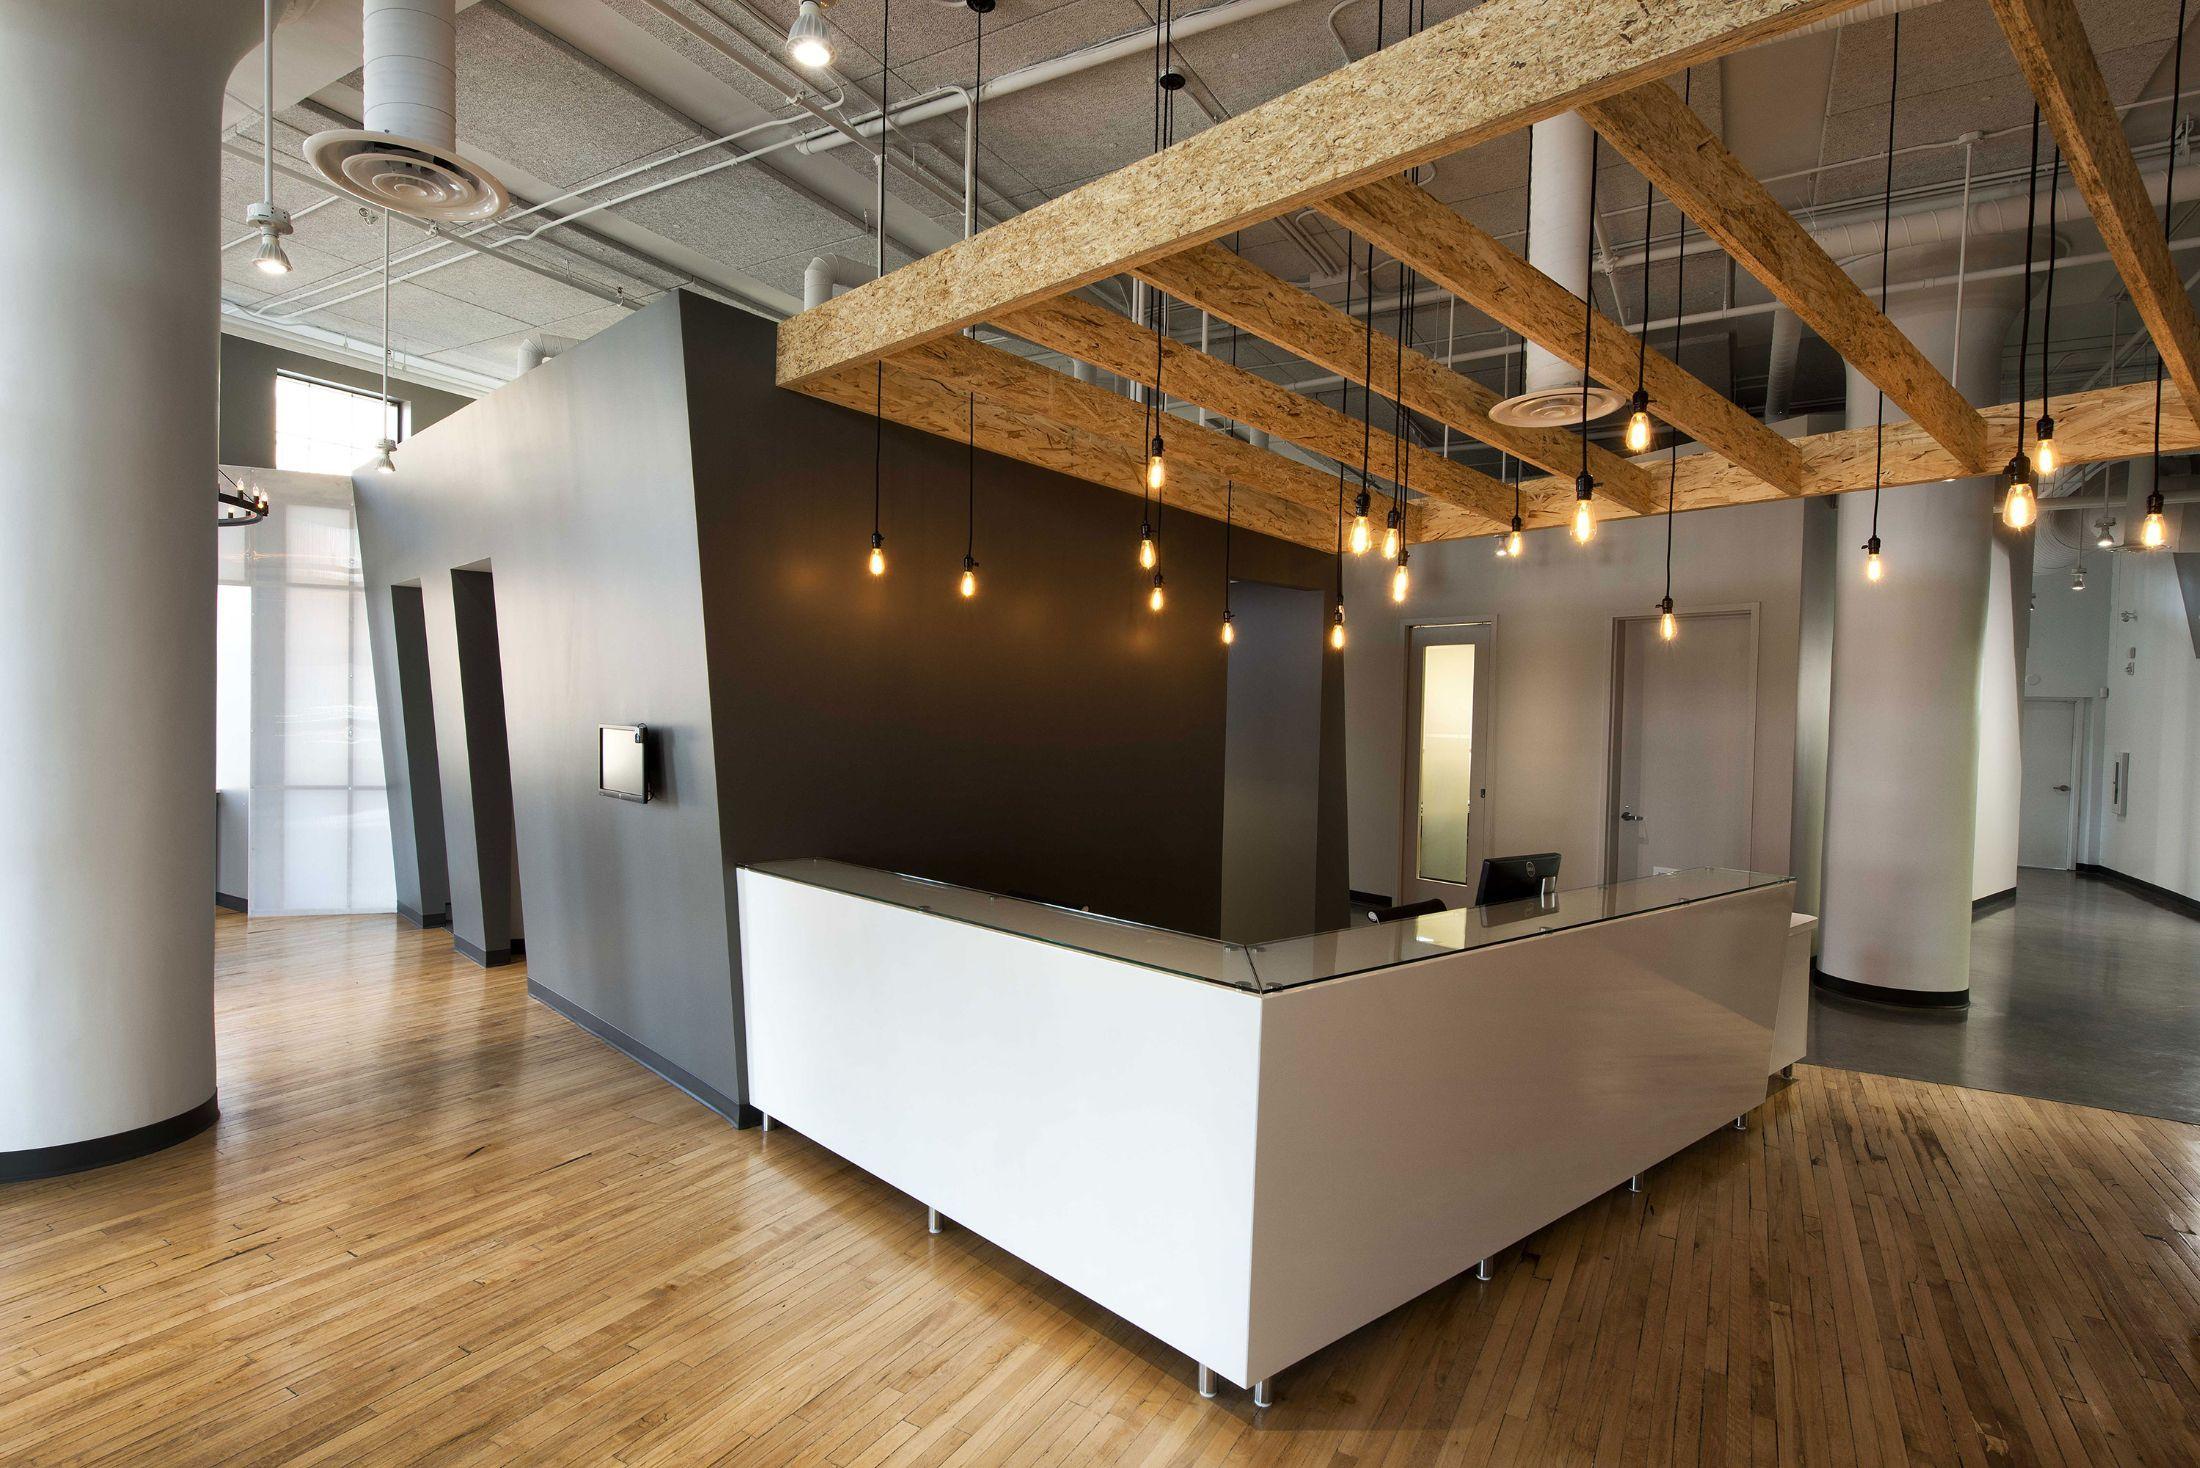 uptown reception | j | healthcare | pinterest | office designs